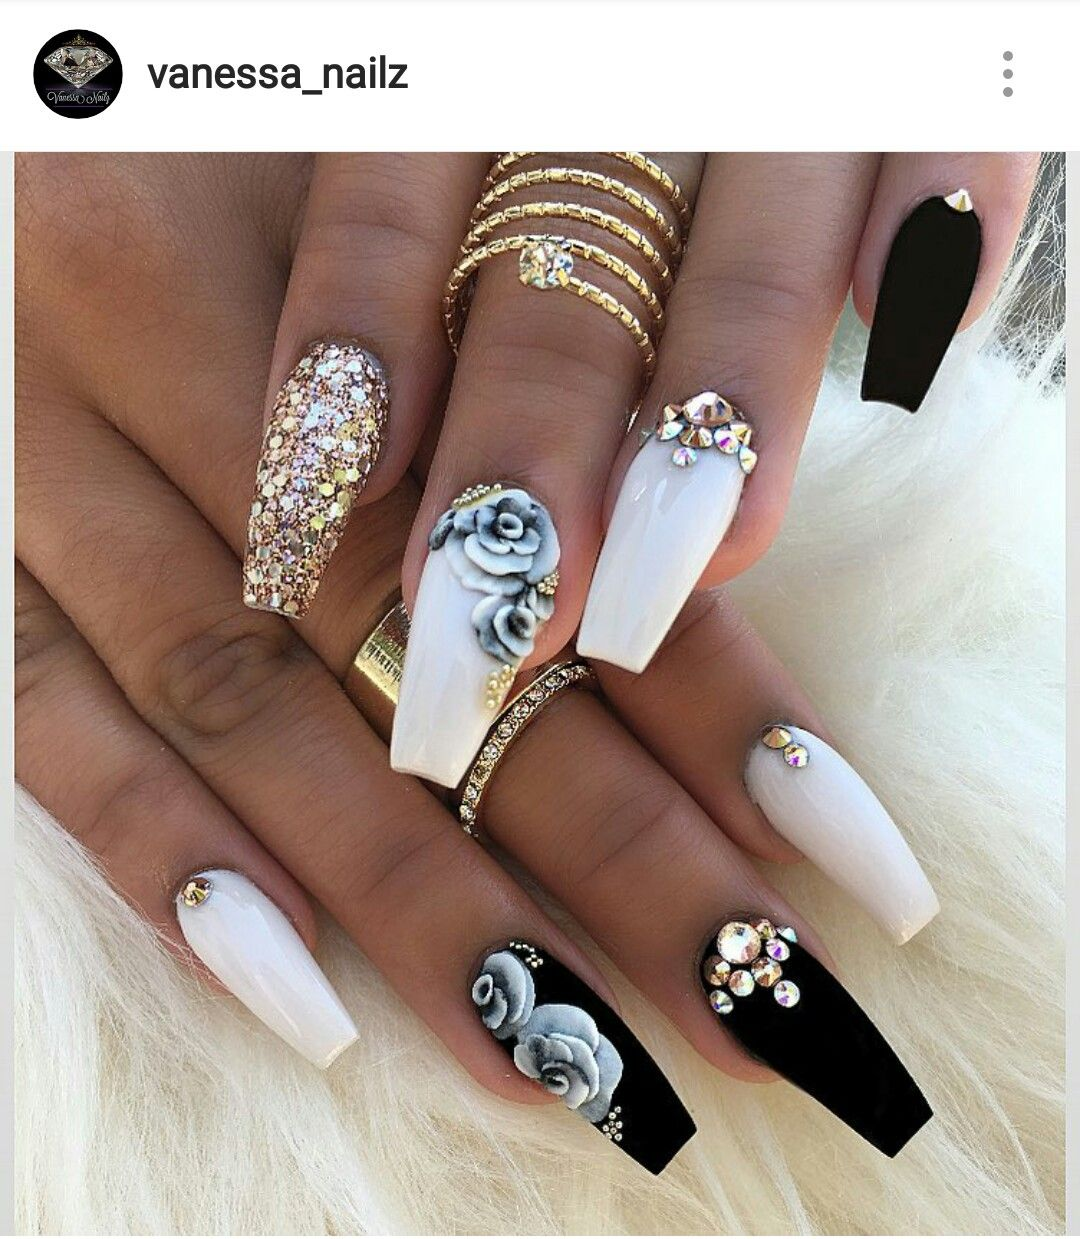 Black, White, & Gold Nails by @vanessa_nailz on IG ...